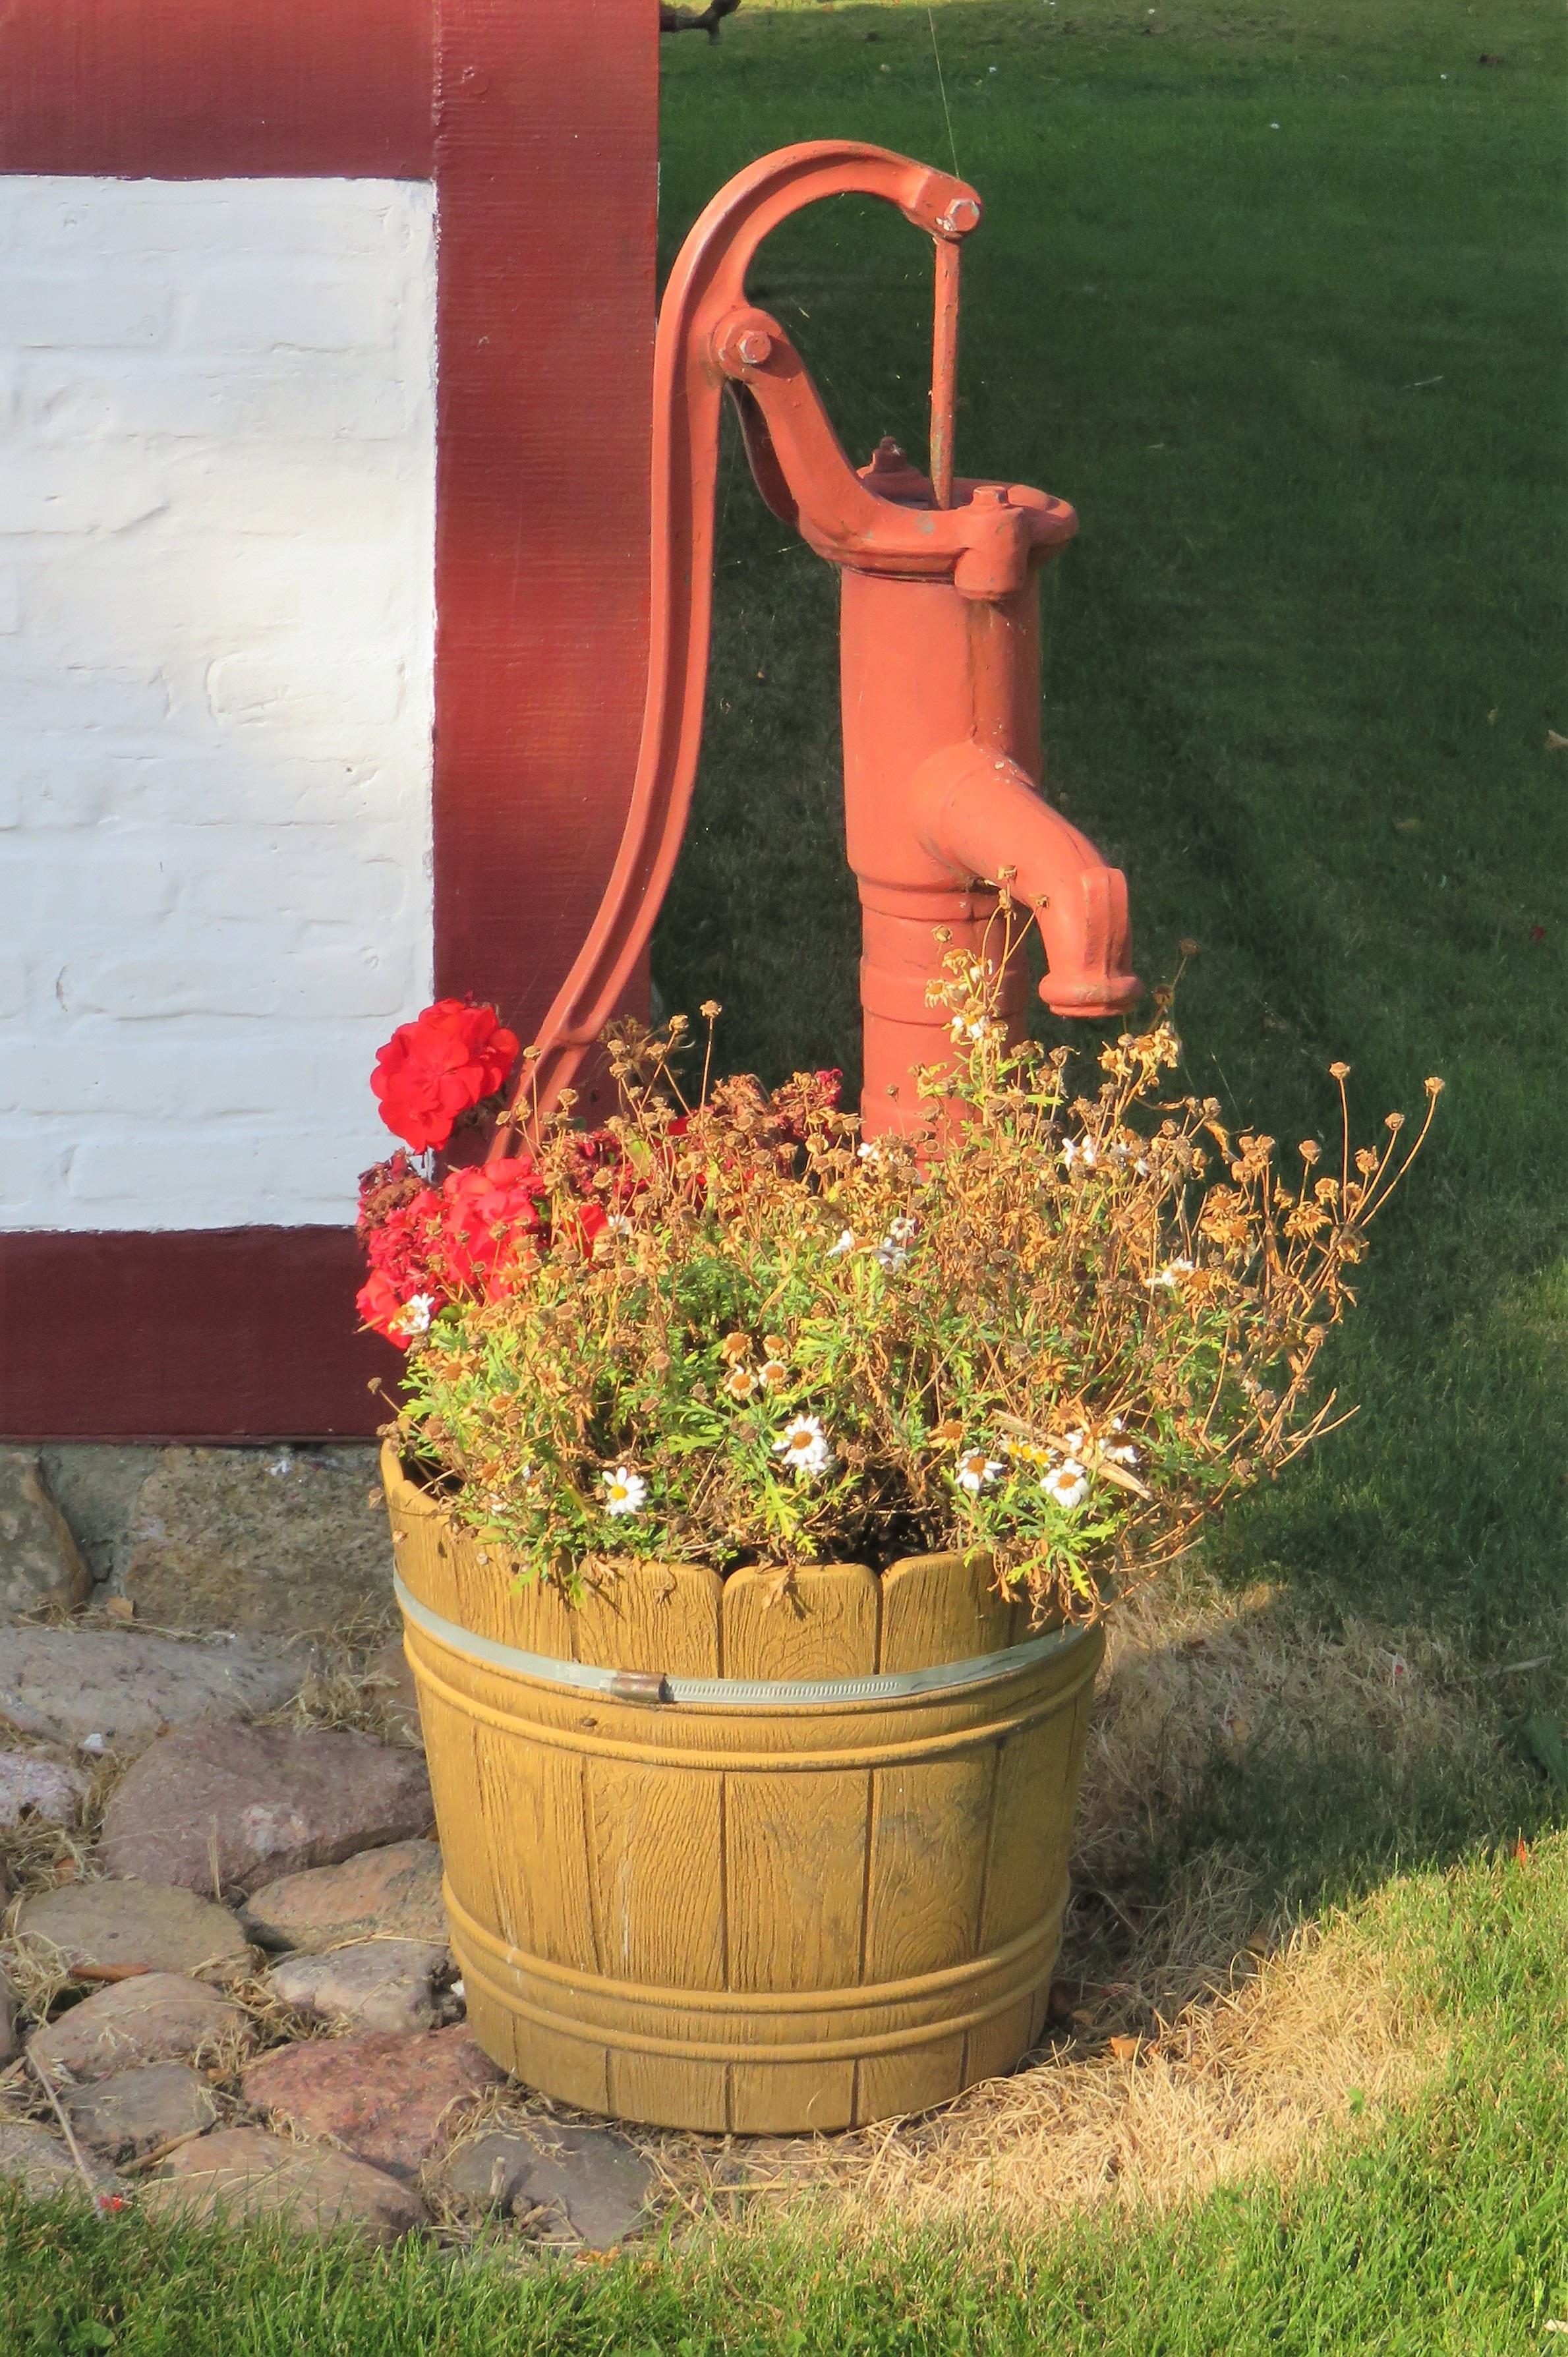 free images : tree, grass, plant, lawn, flower, backyard, botany